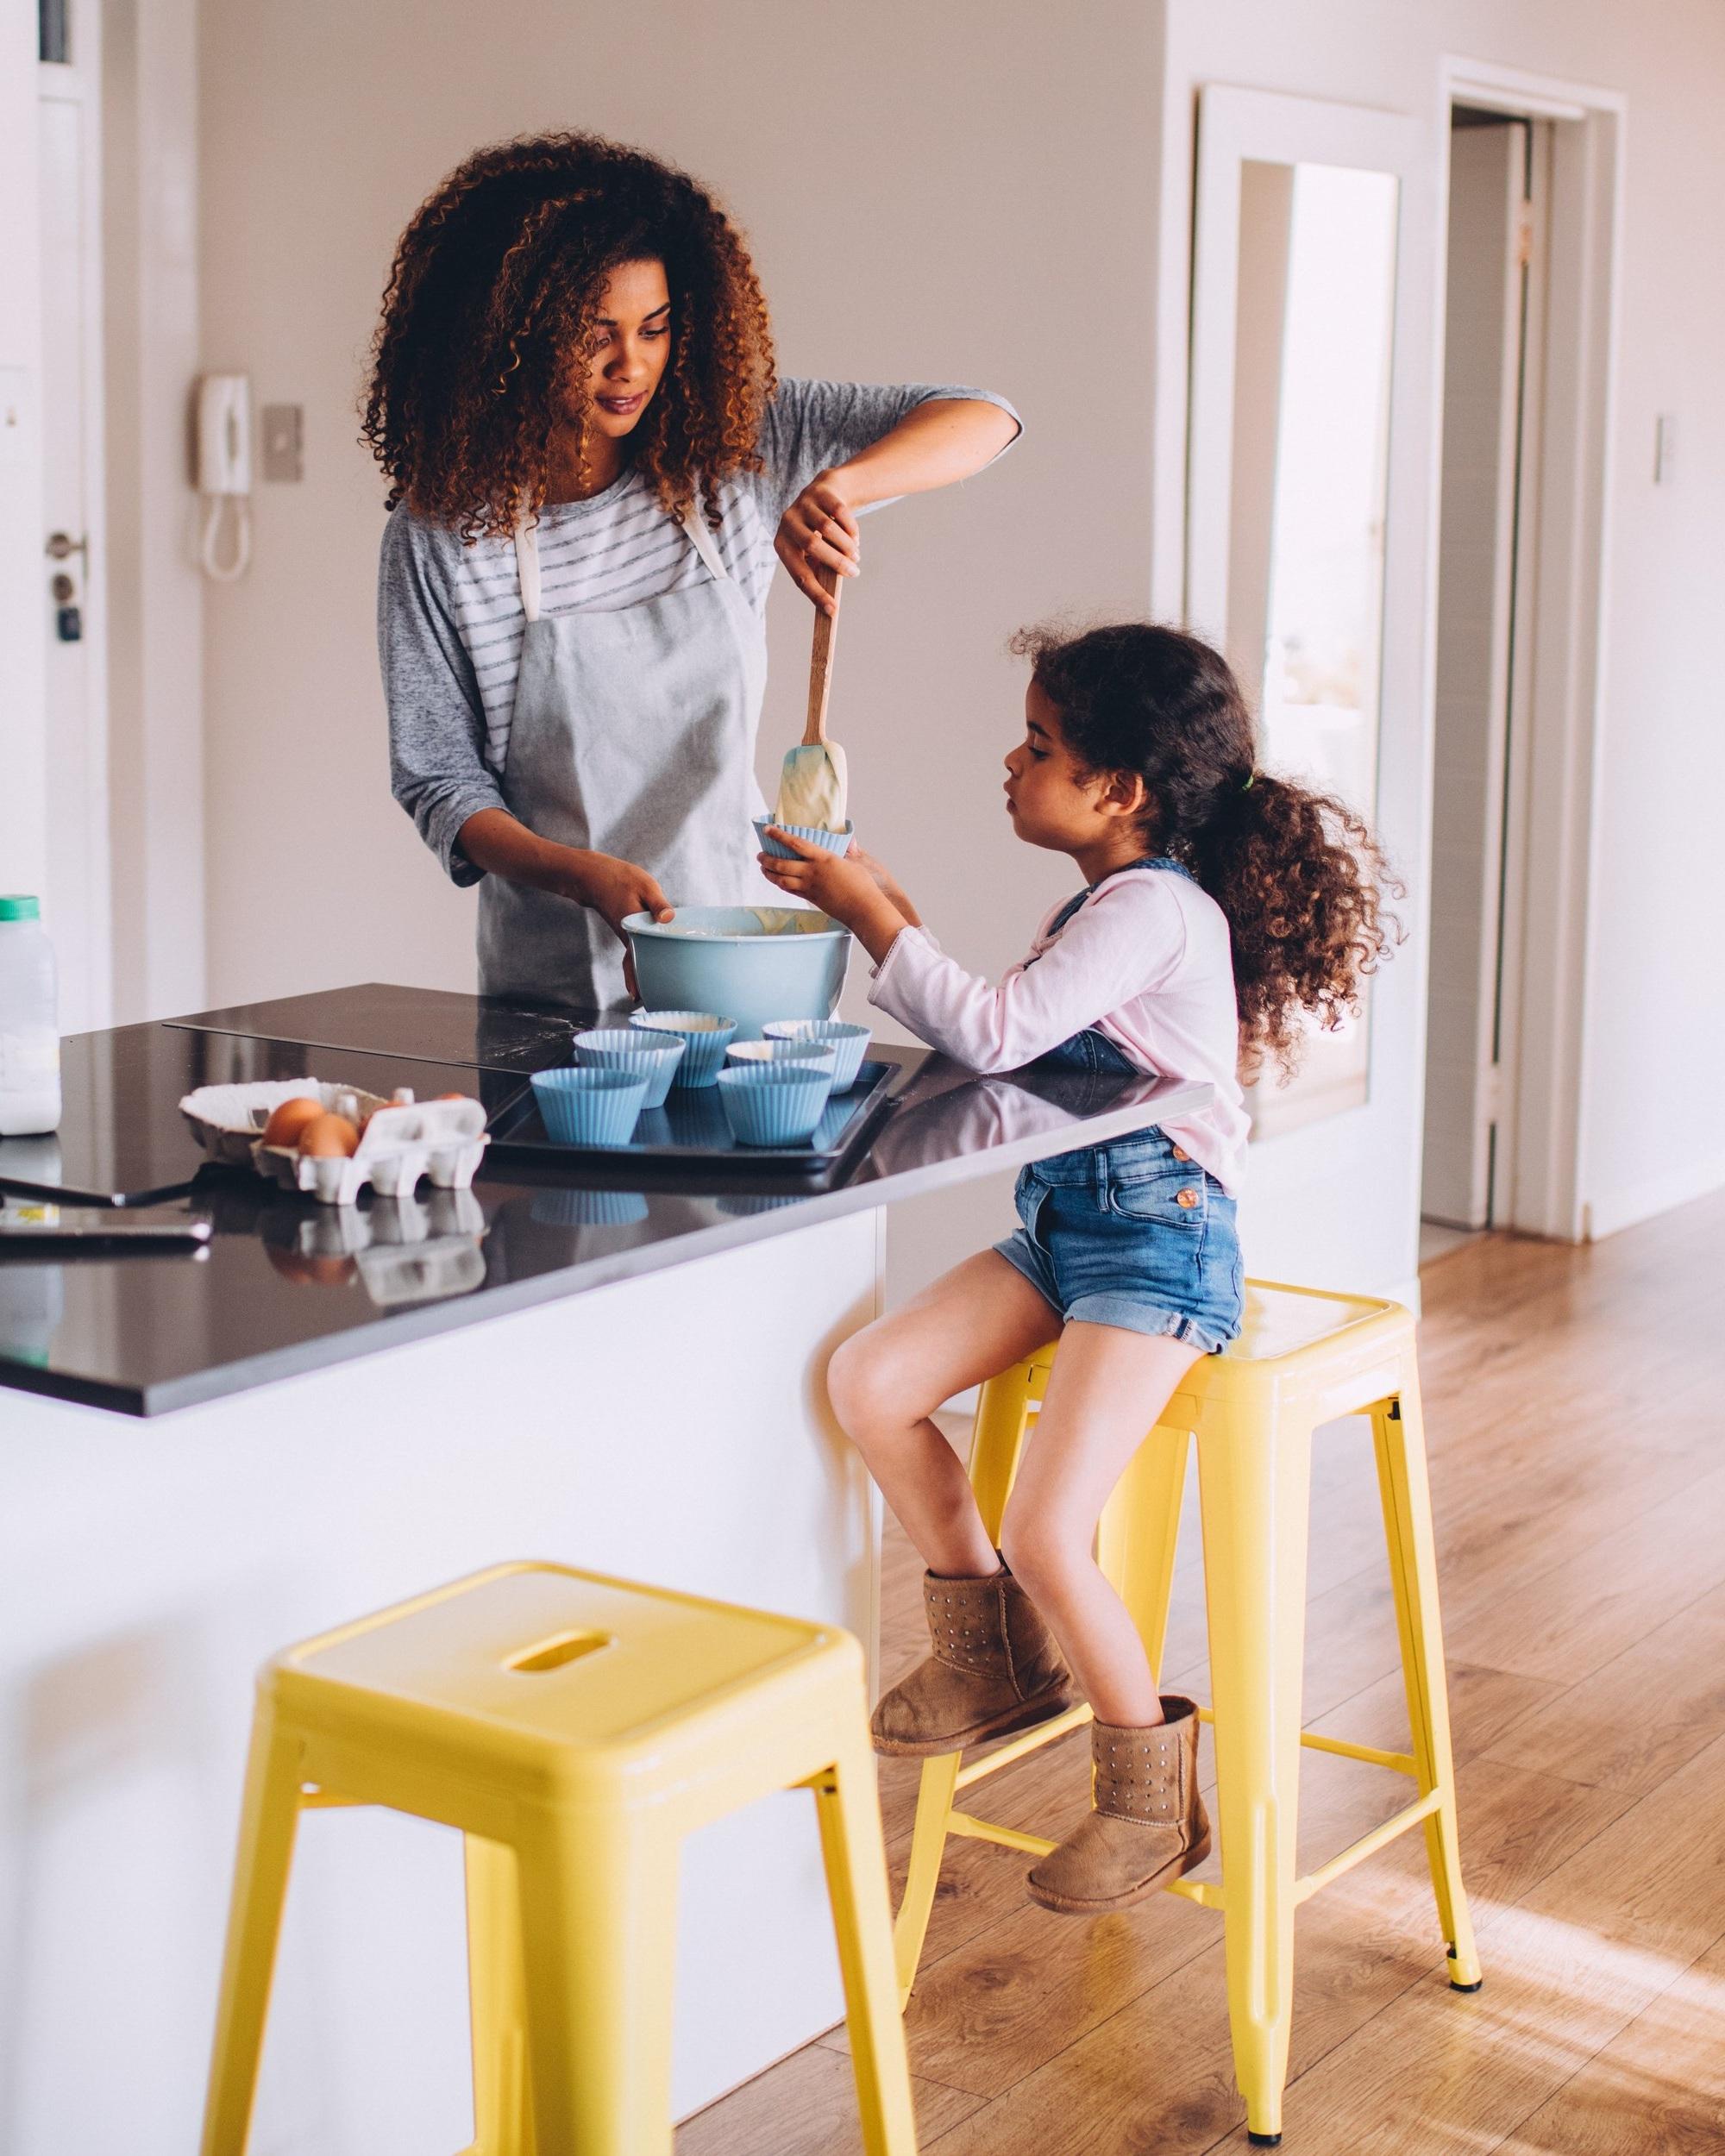 cooking-baking-kitchen-kitchen-girl-mother-home-children-daughter-kids-african-american_t20_1b7aQ1.jpg